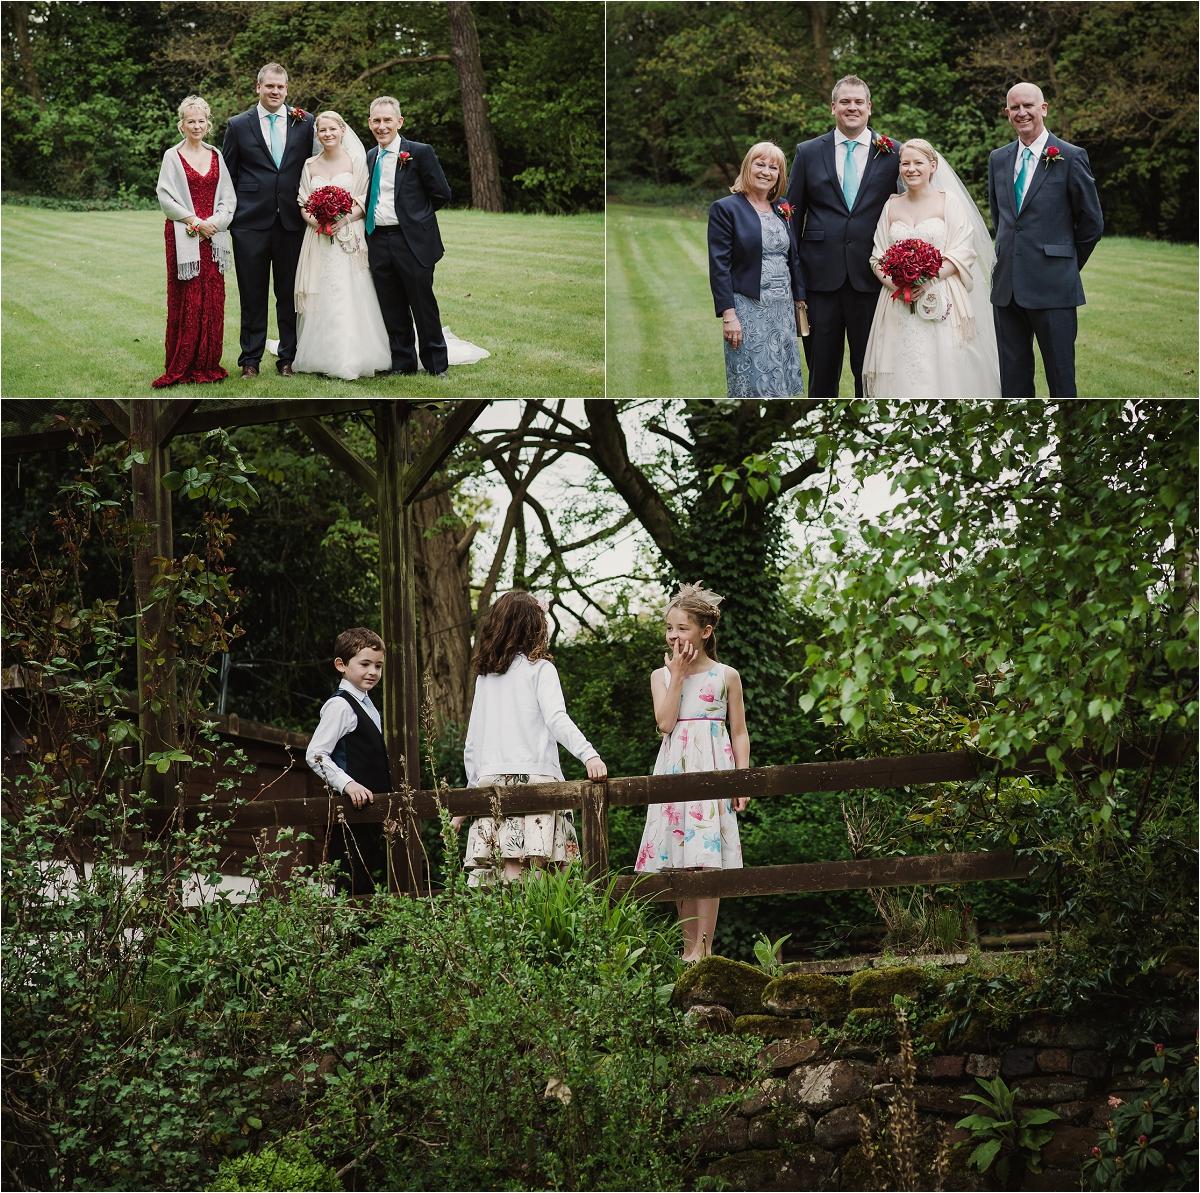 dan_emma_wedding_0024.jpg